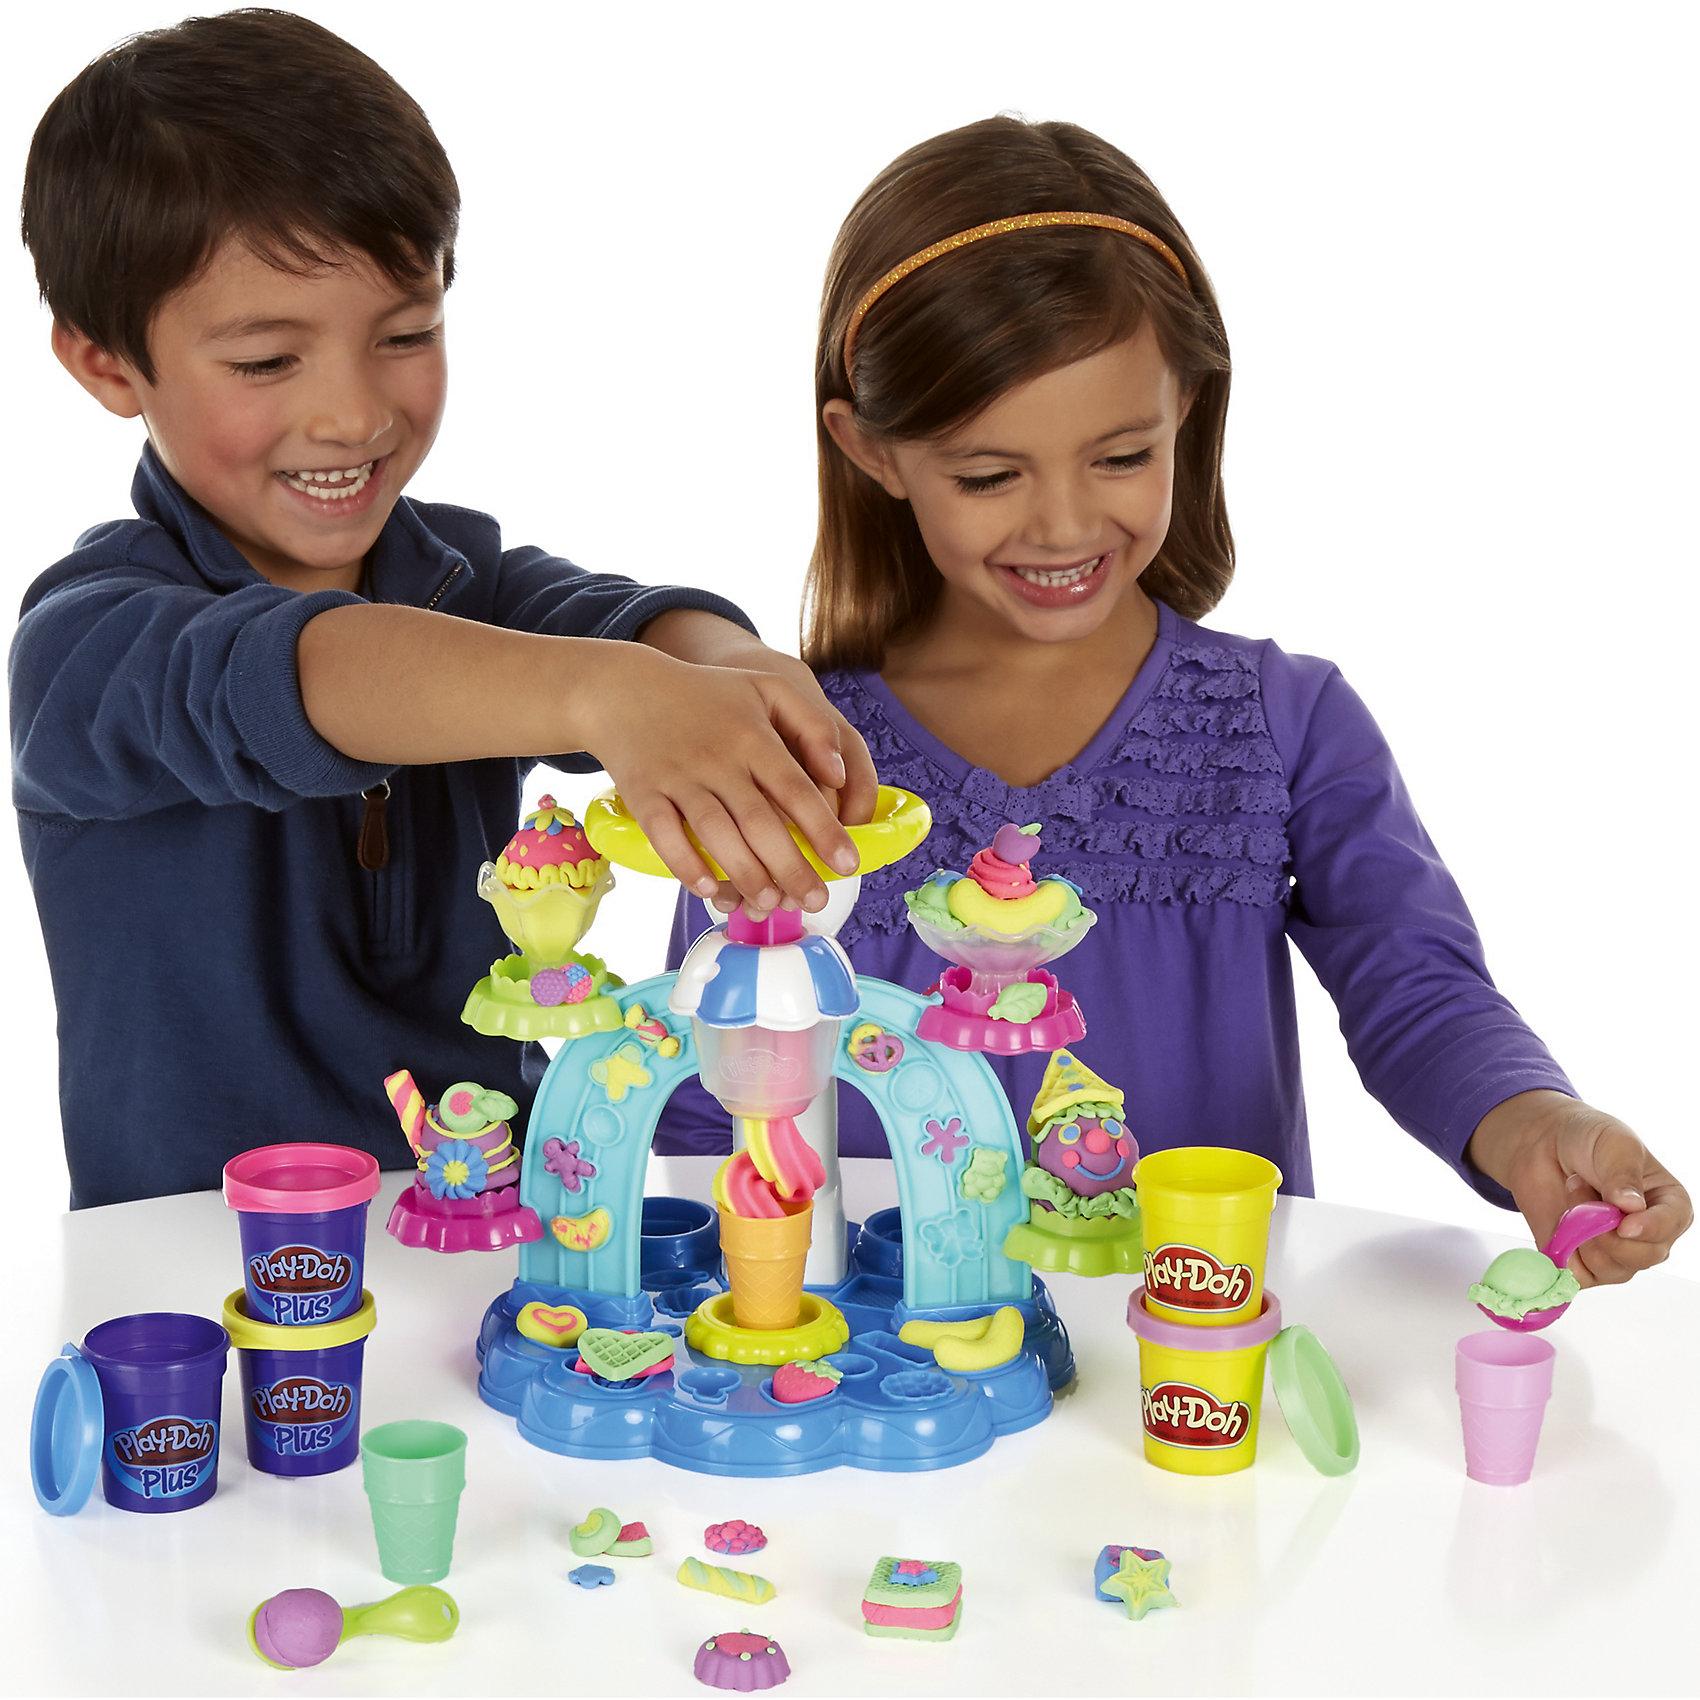 Hasbro Игровой набор Фабрика мороженого, Play-Doh